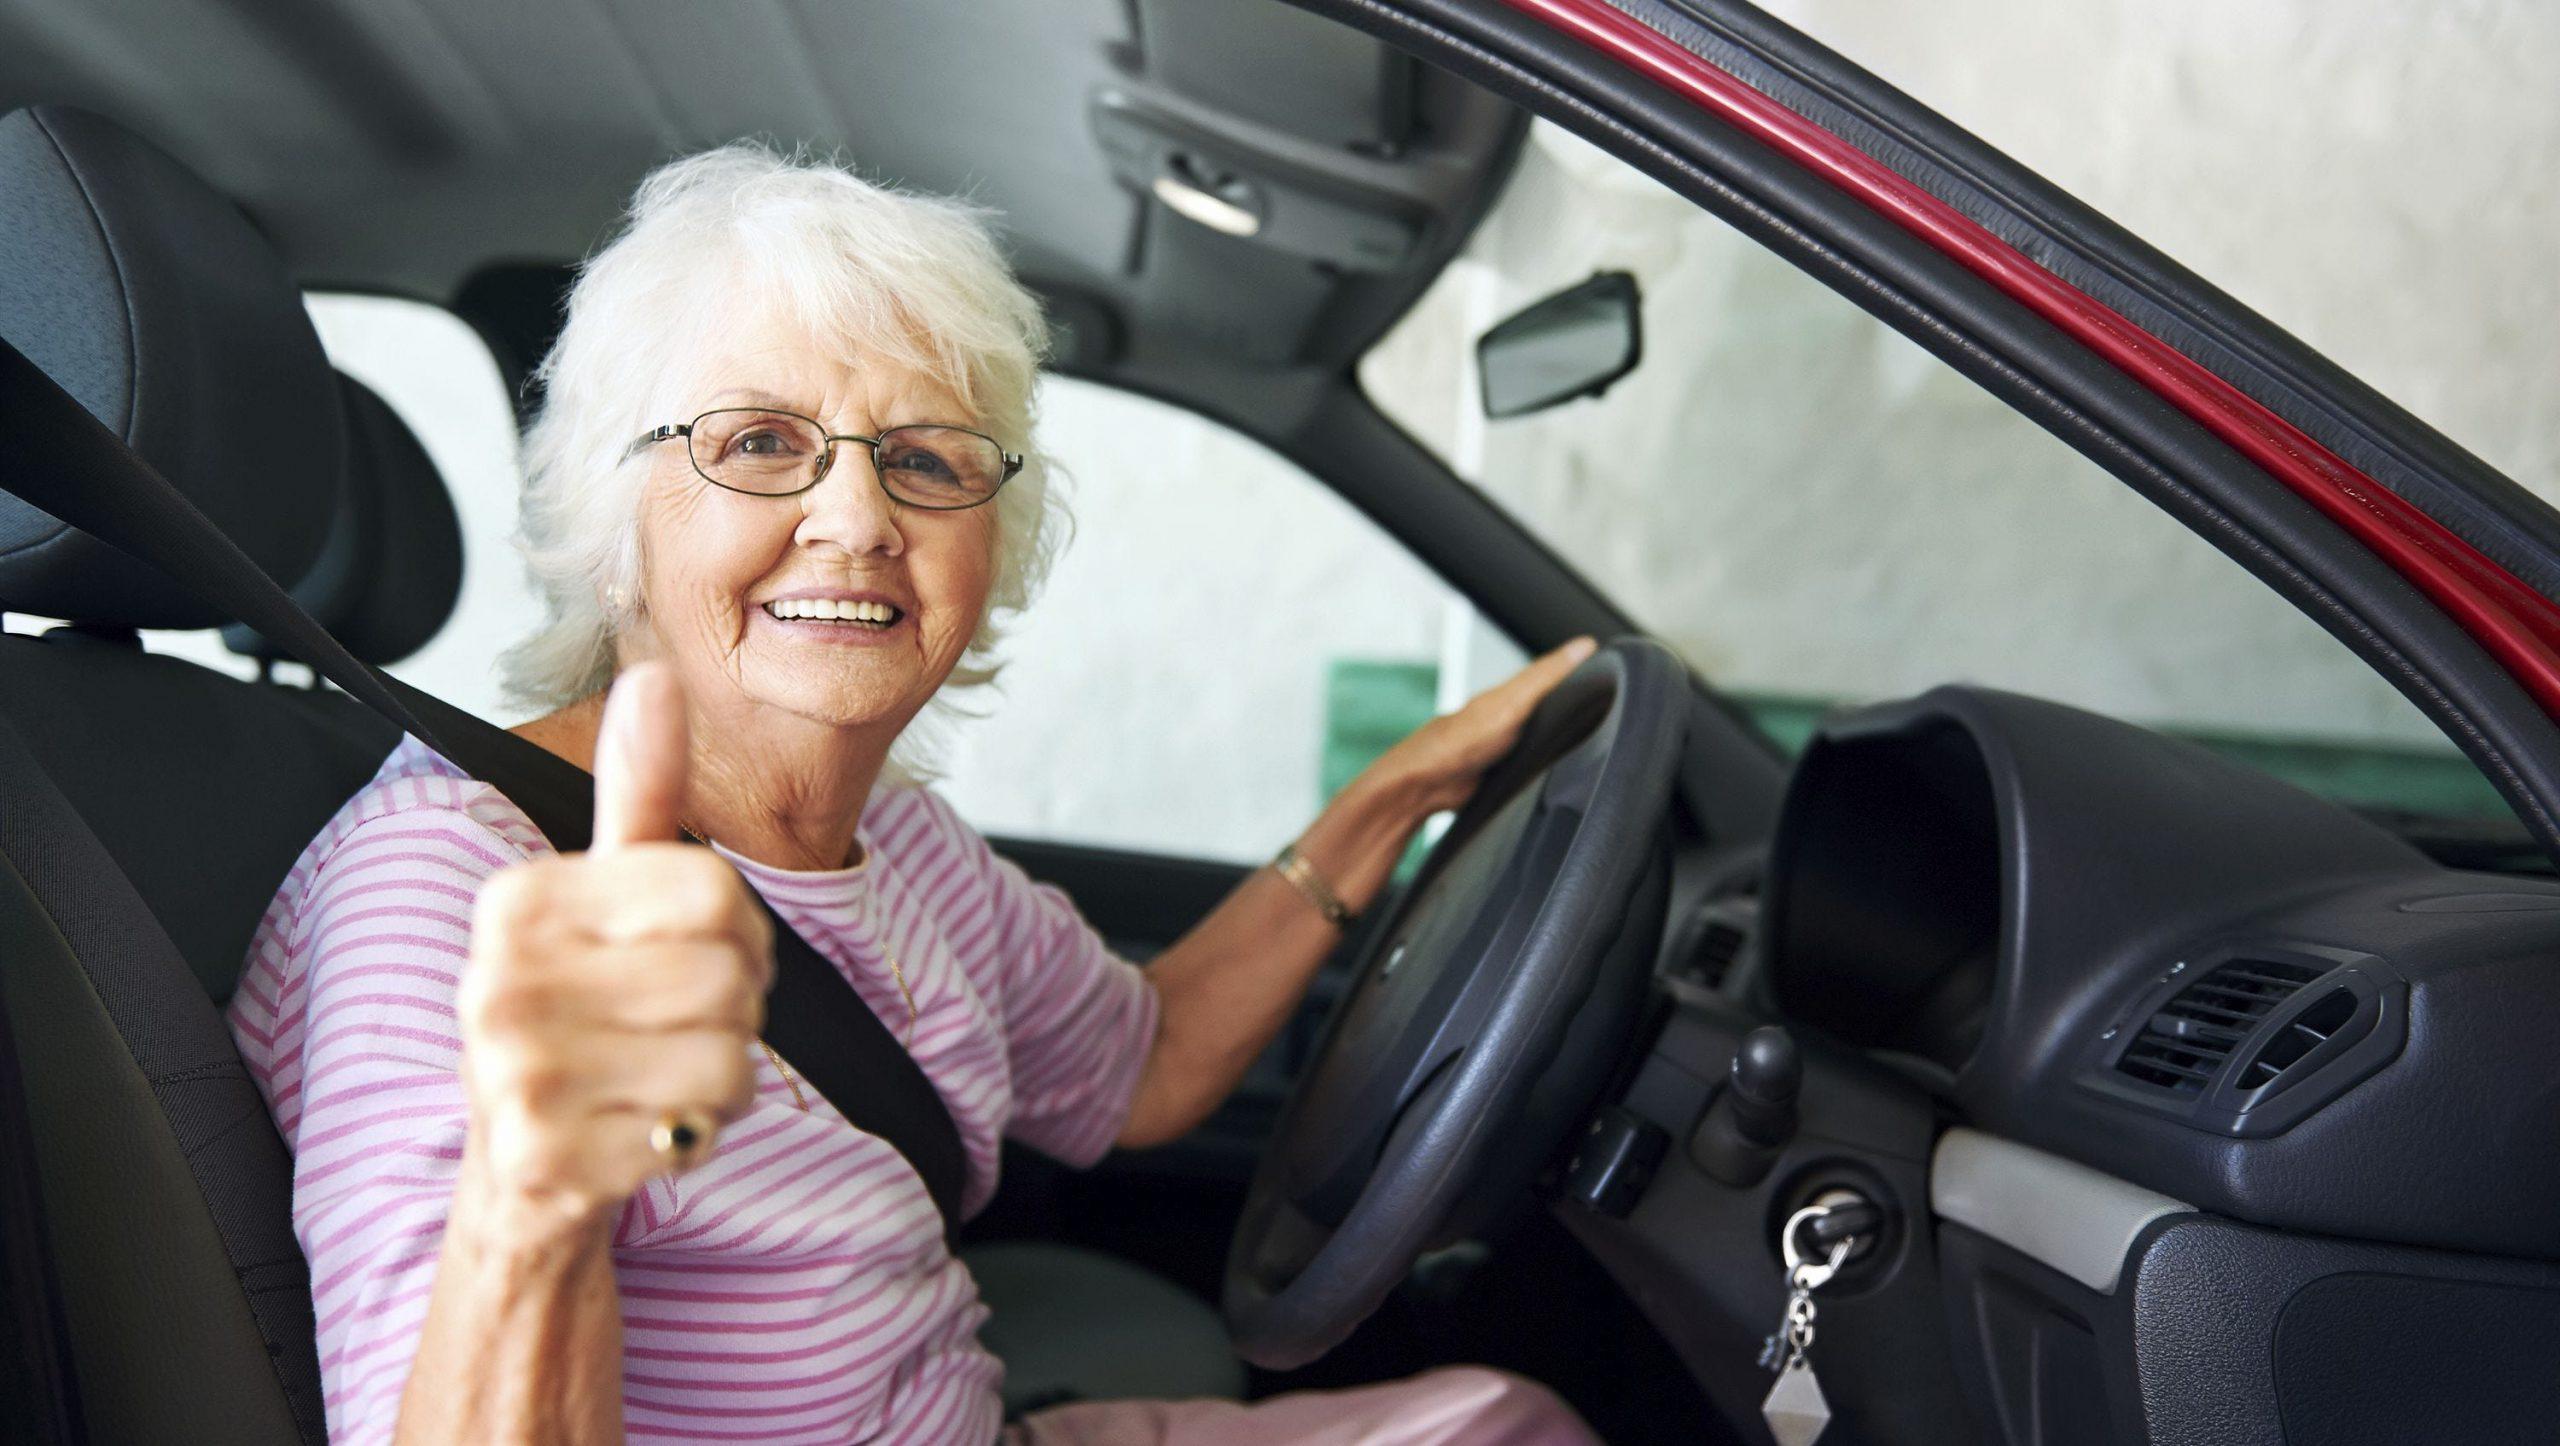 Auto insurance discounts for seniors